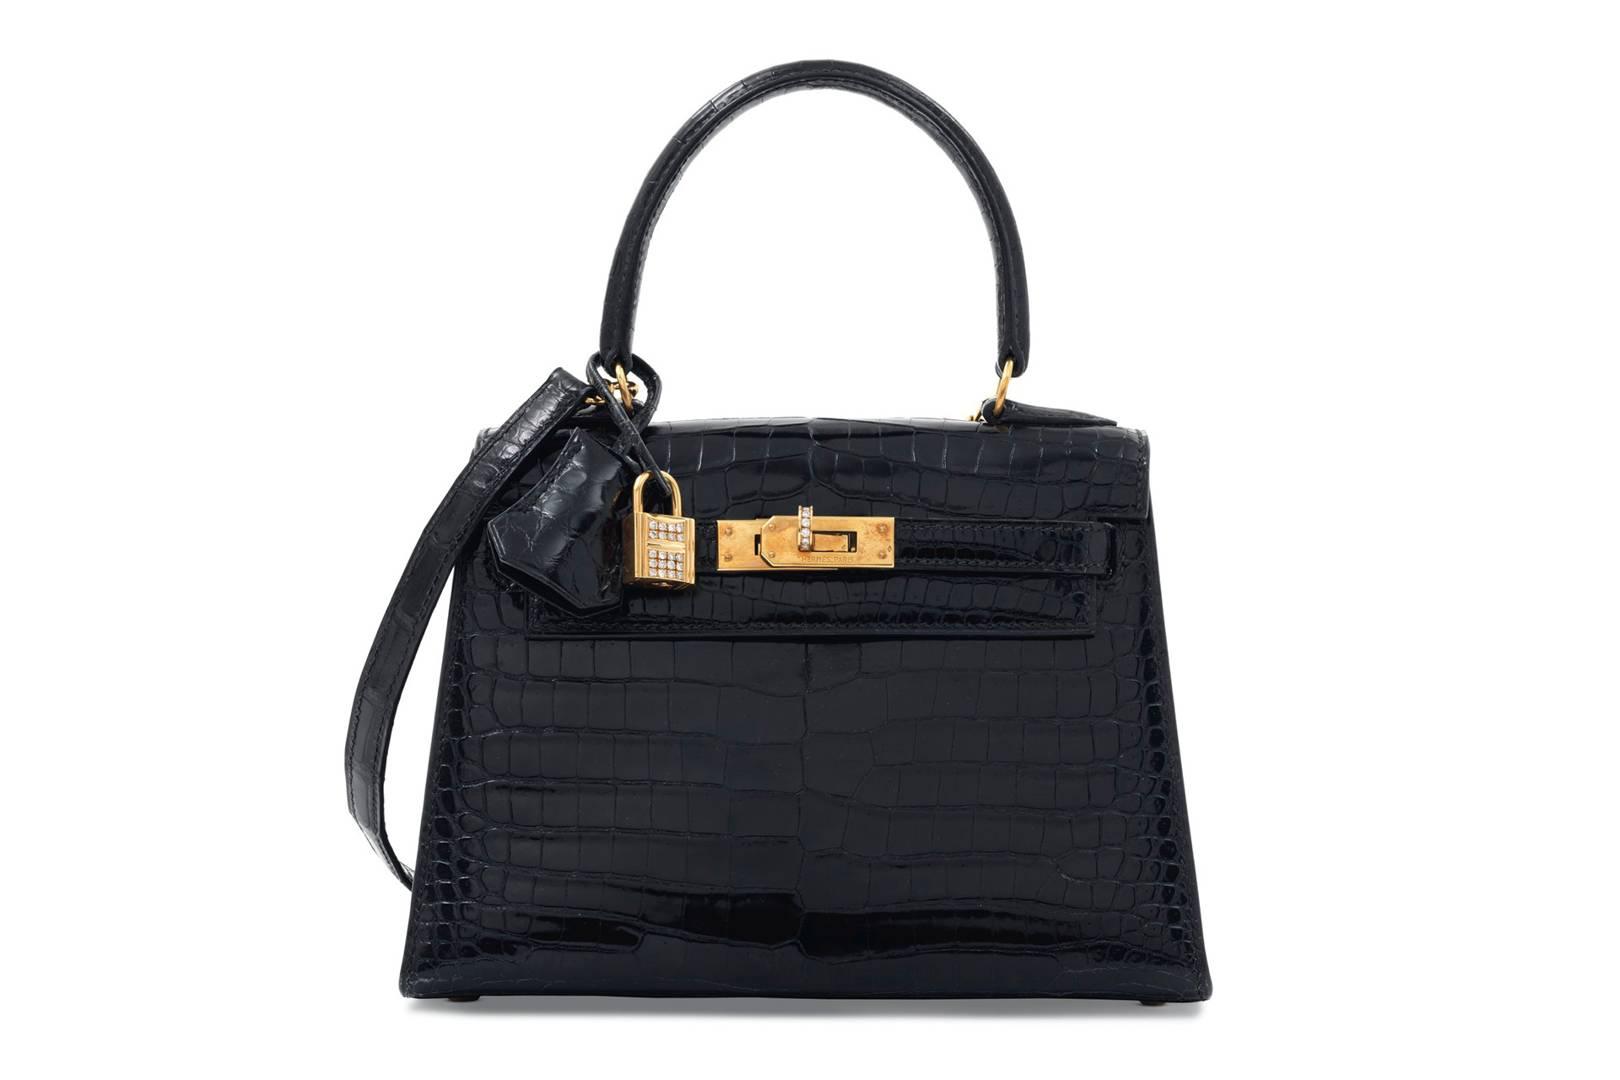 d622ba1adcf1 Preview: Christie's Handbags & Accessiories sale 2018 | Tatler